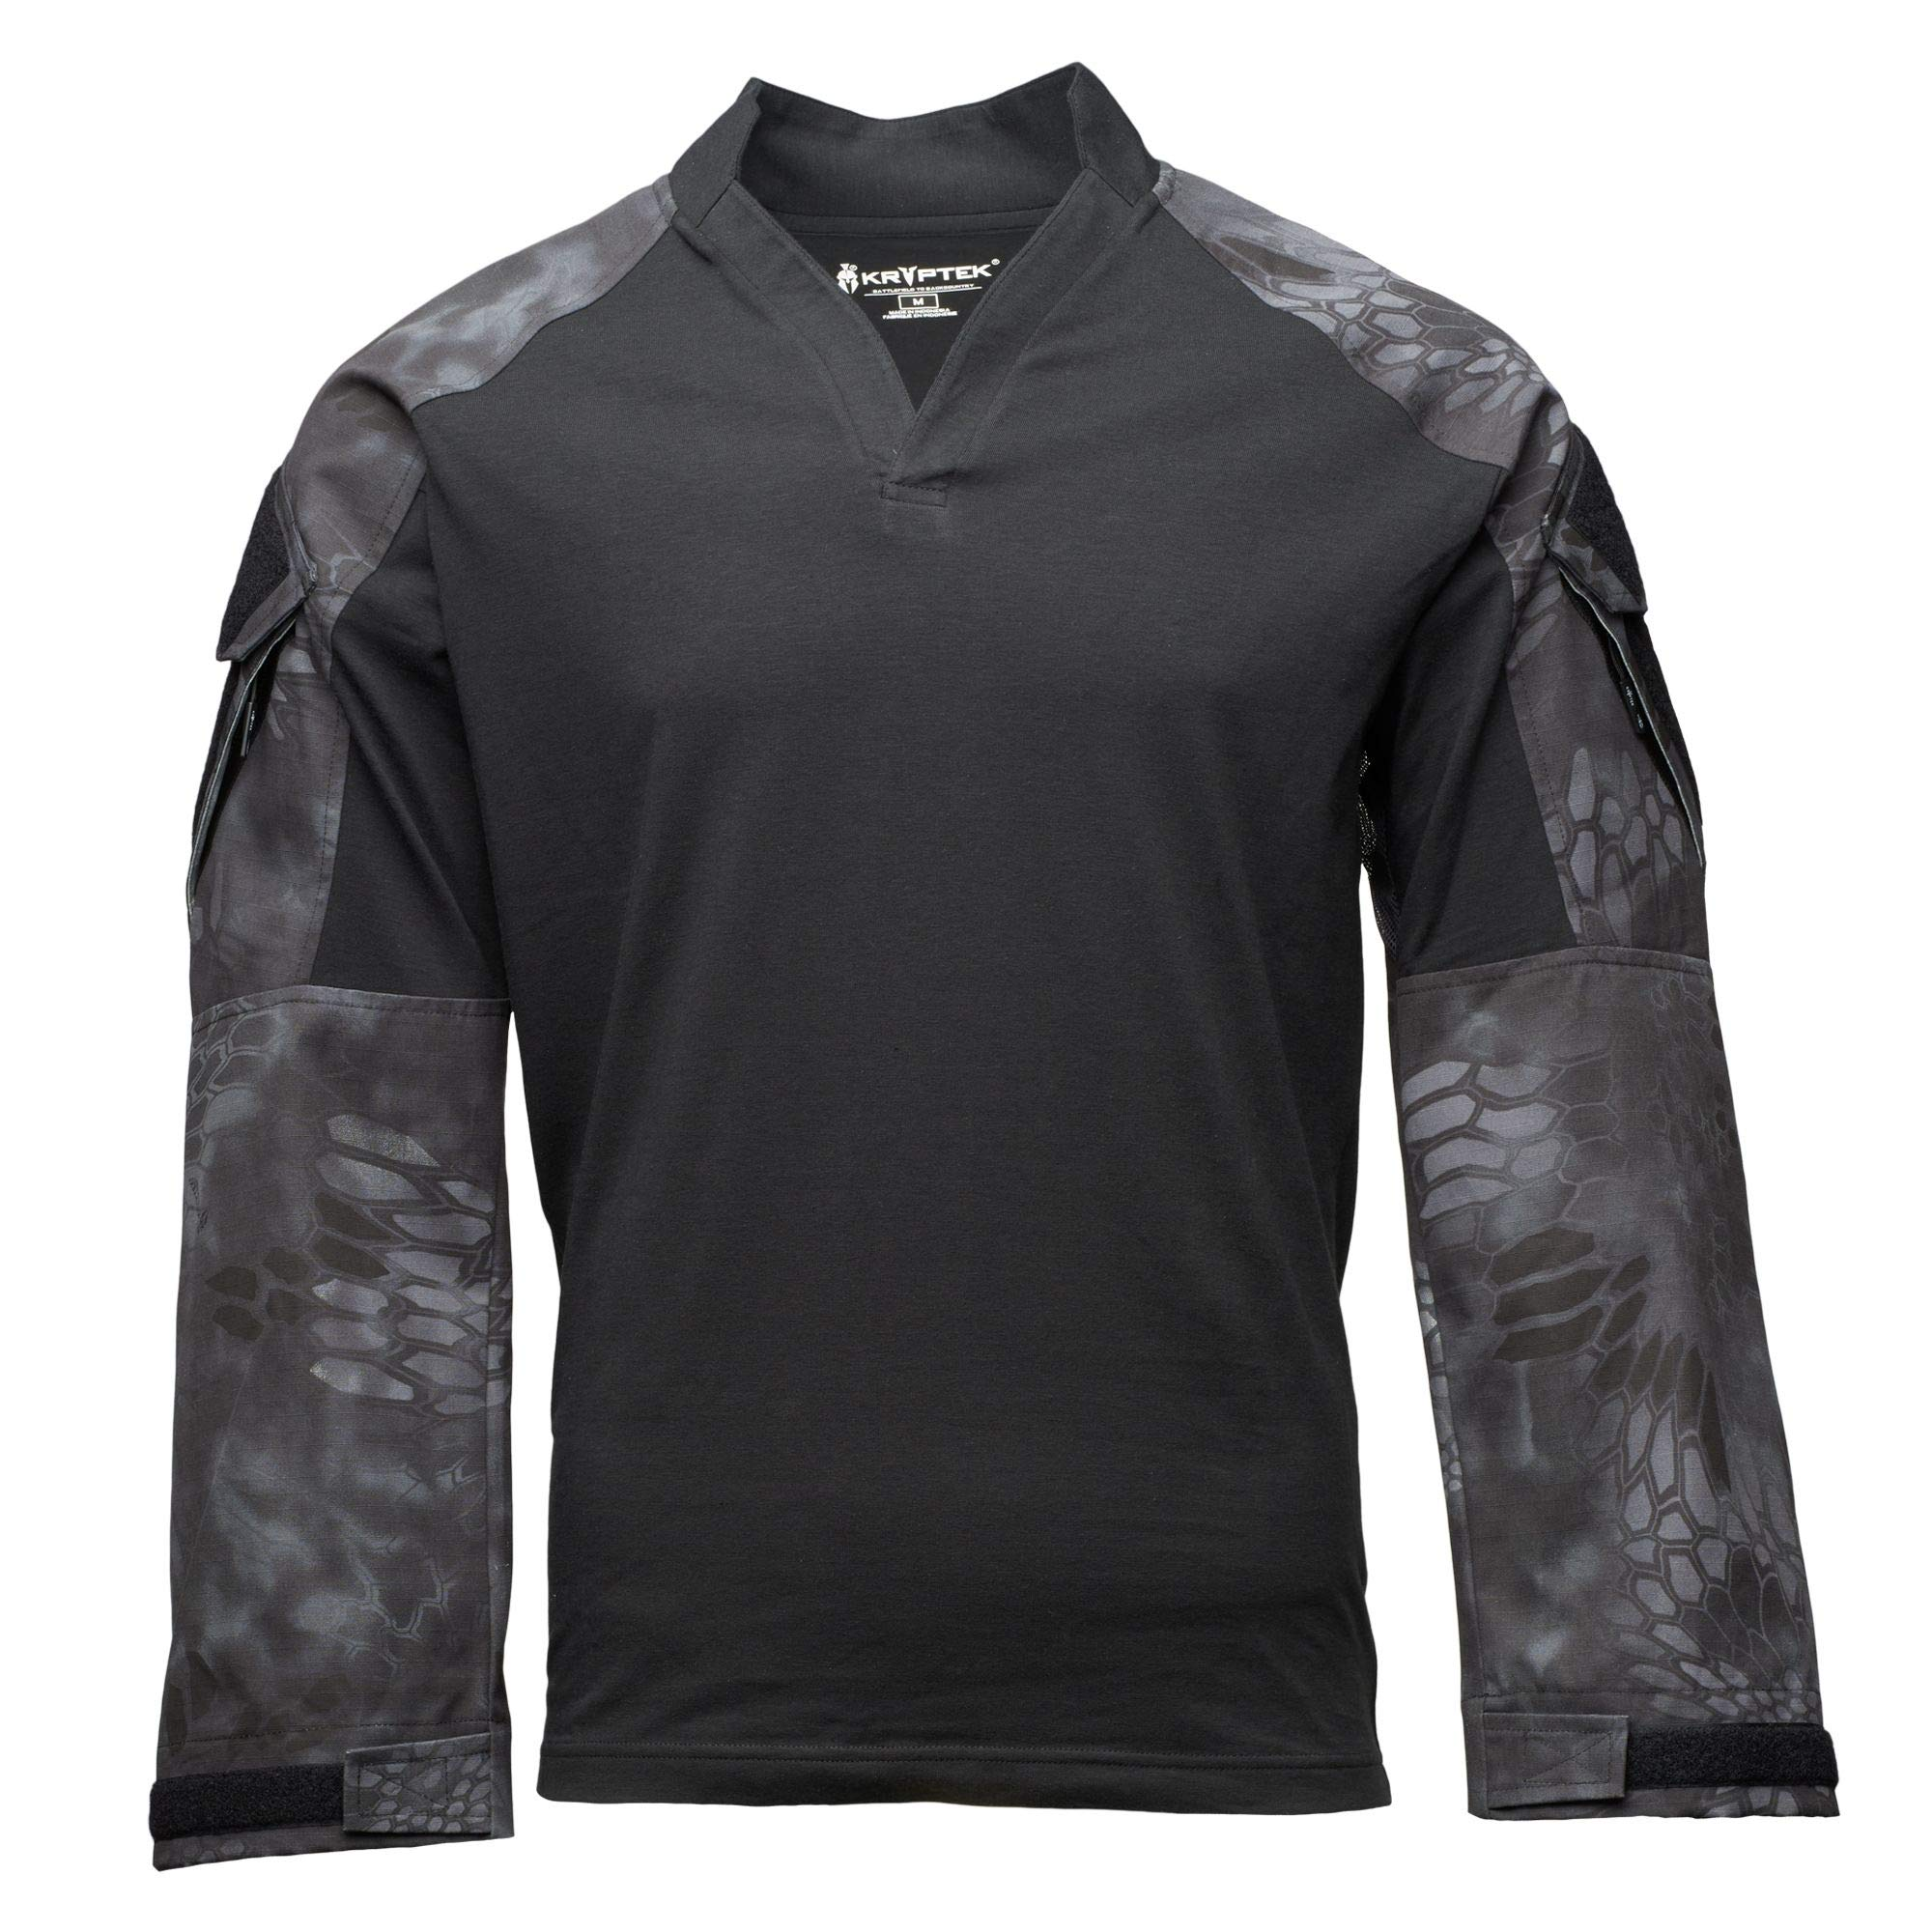 Kryptek Tactical LS Rugby Long Sleeve Shirt (Tactical Collection), Black/Typhon, L by Kryptek